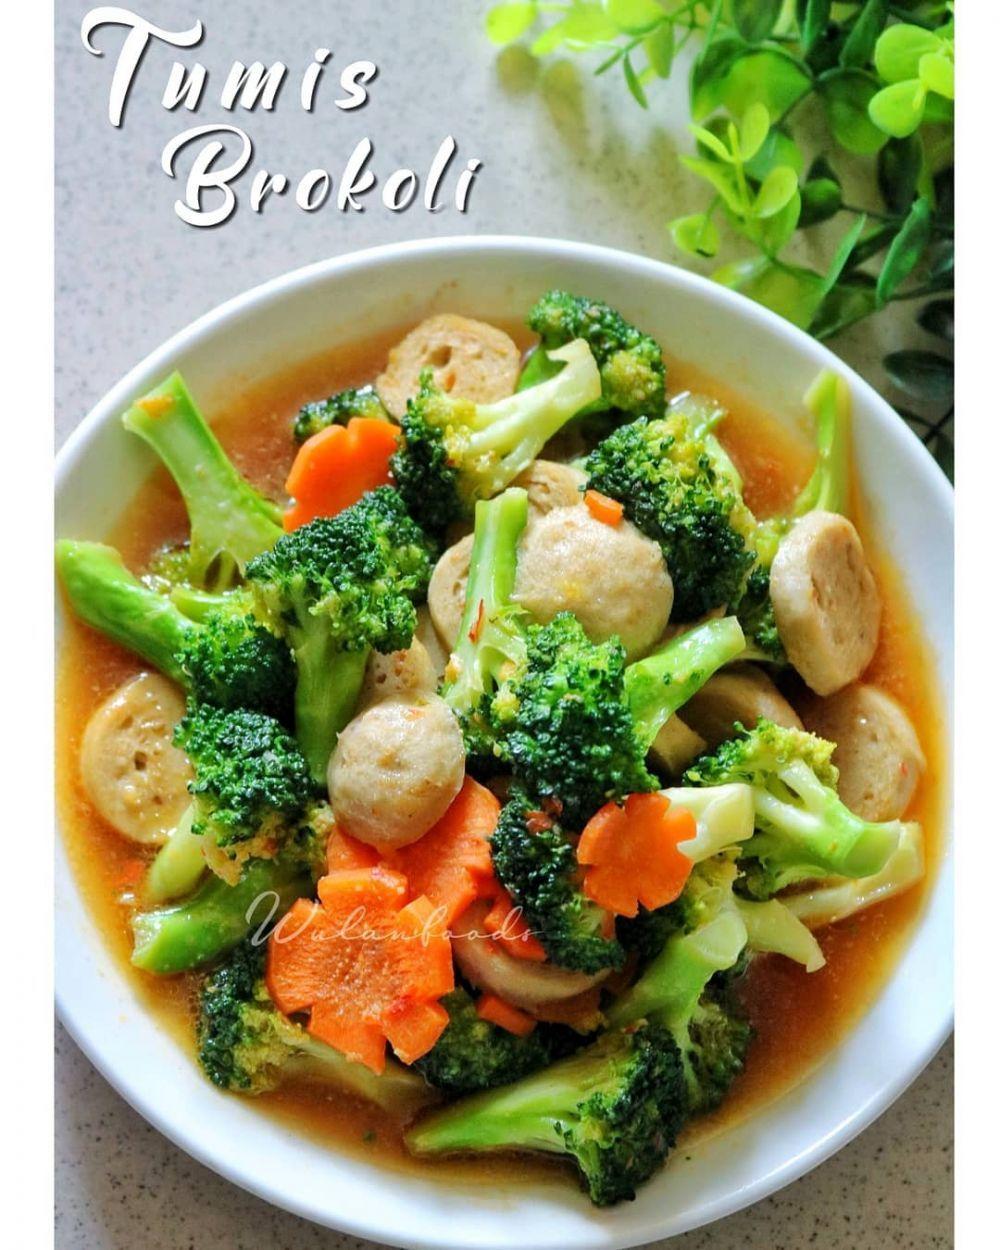 15 Resep Tumis Ala Anak Kos Enak Sederhana Dan Praktis Instagram Resepjajananpasar Wulanfoods Masakan Resep Masakan Tumis